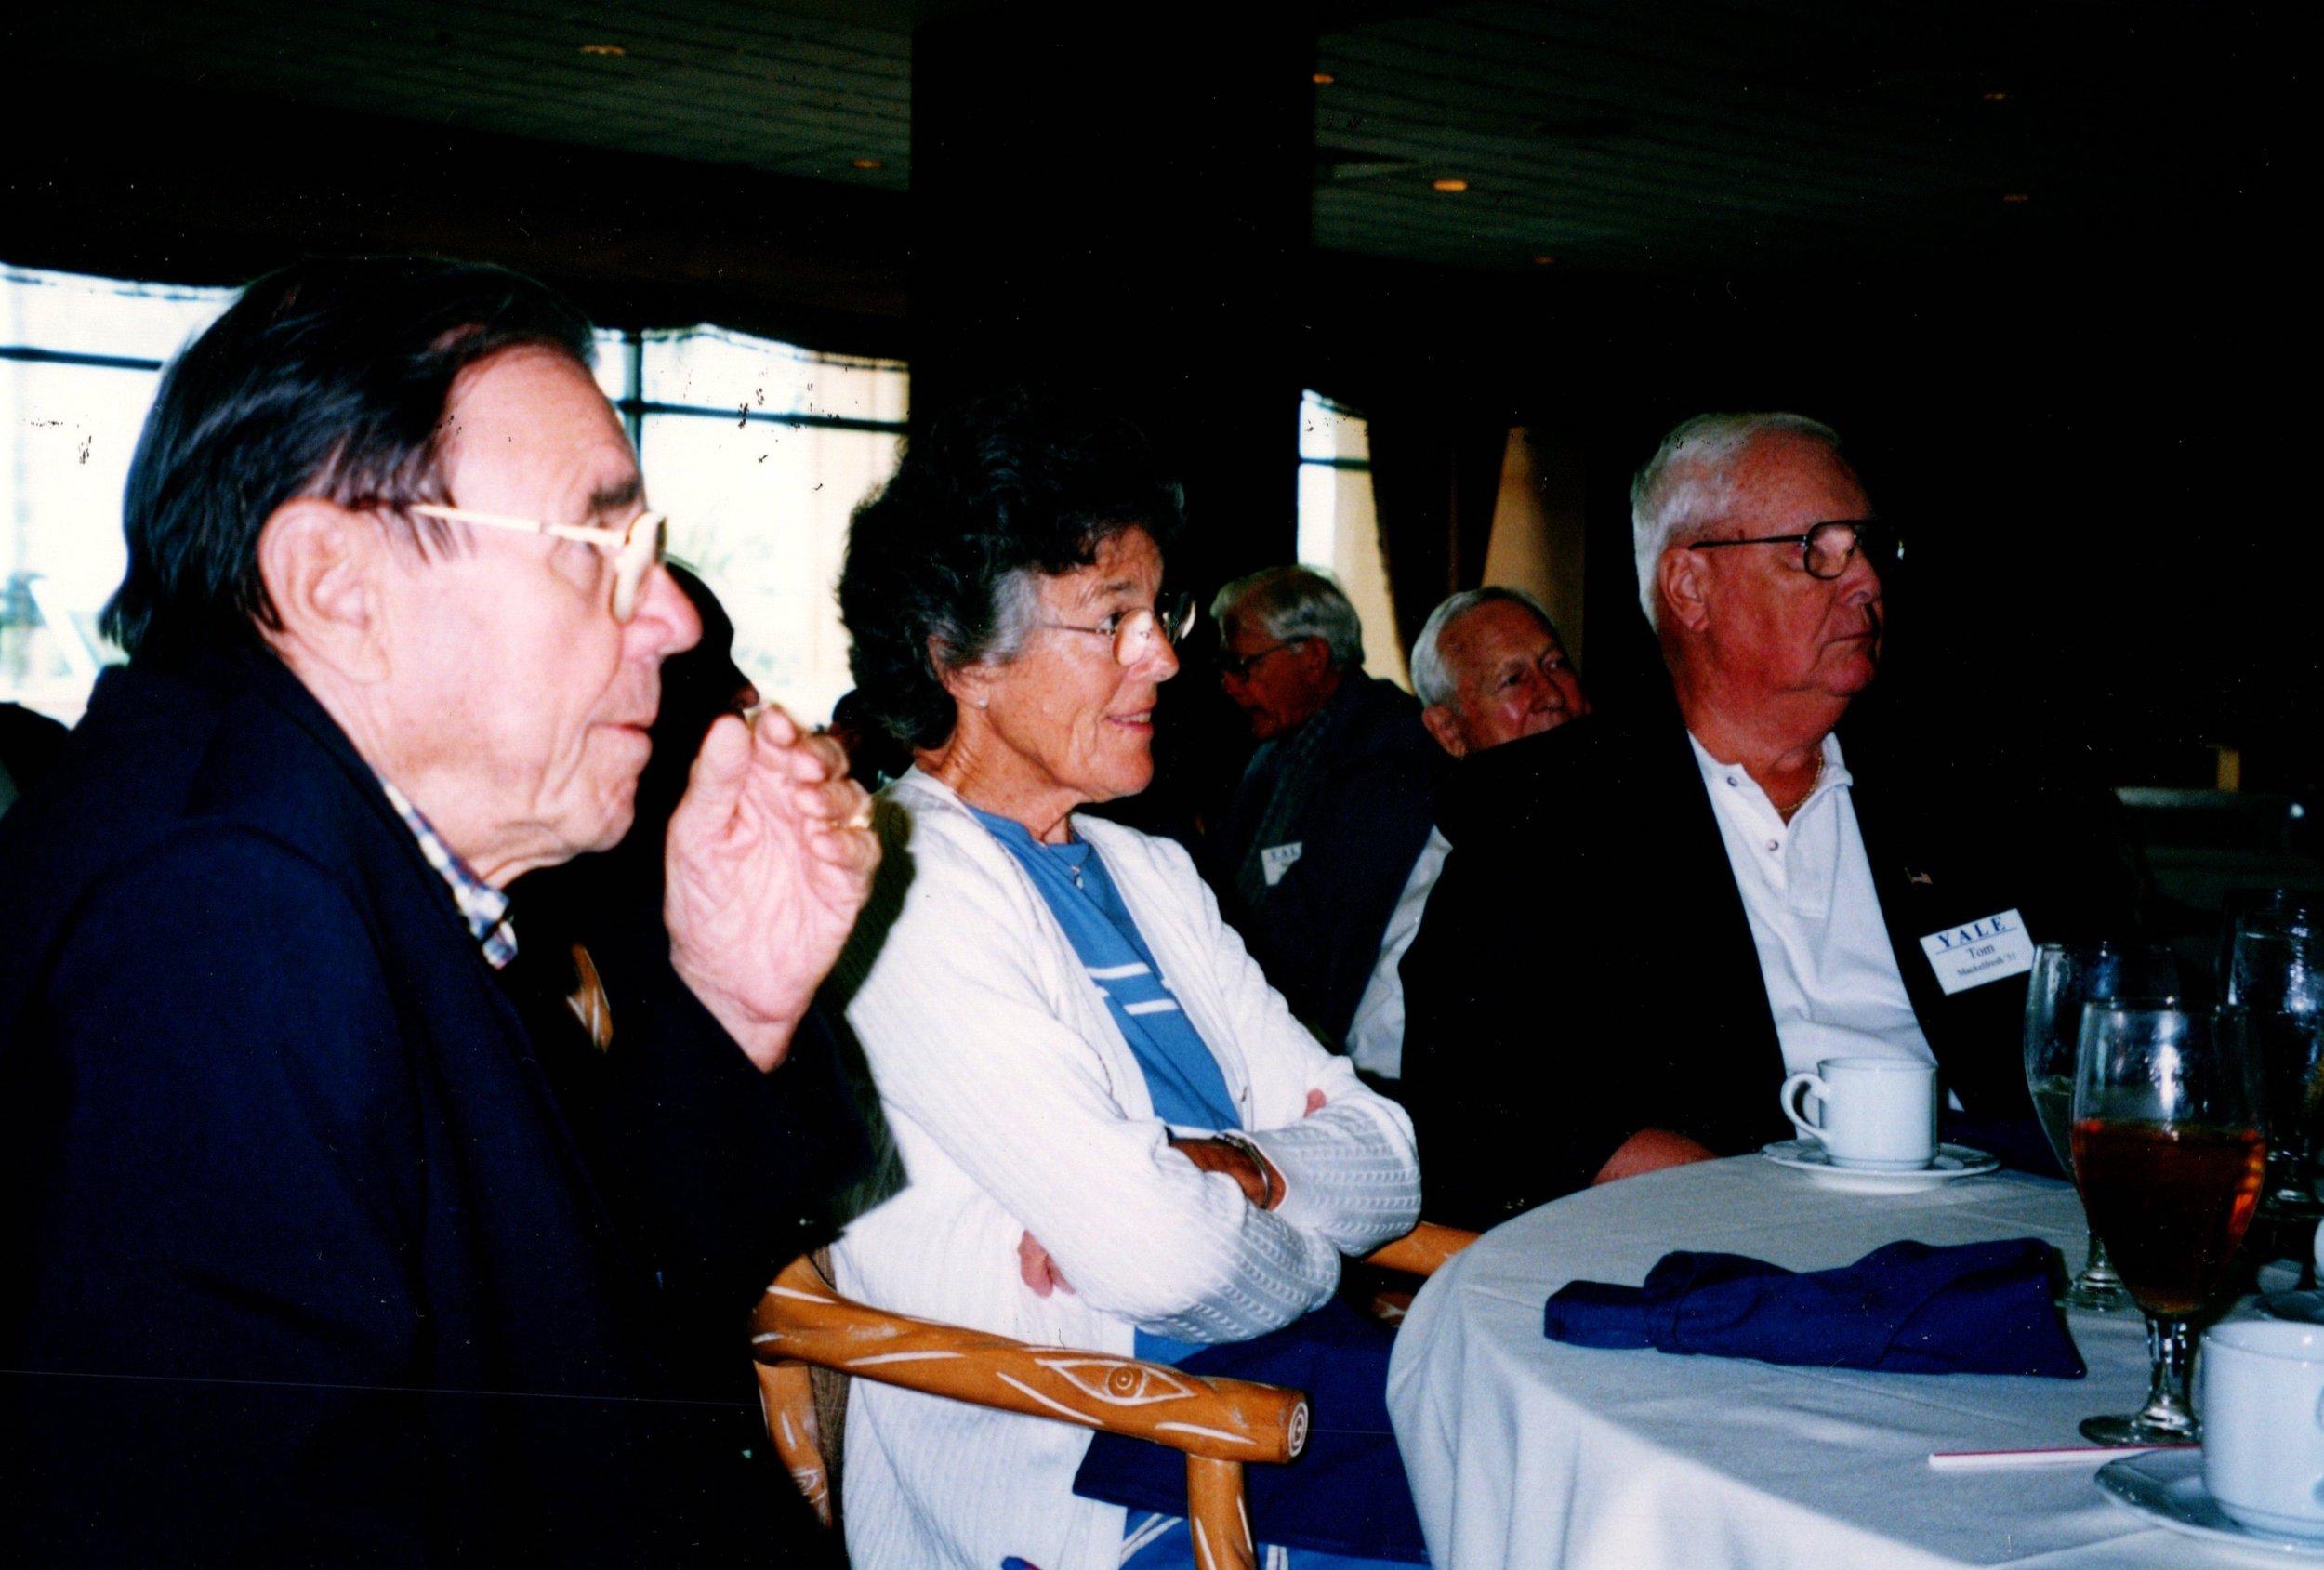 3_13_2003 - COACH SIEDLECKI LUNCHEON - VINEYARDS COUNTRY CLUB 5.jpg